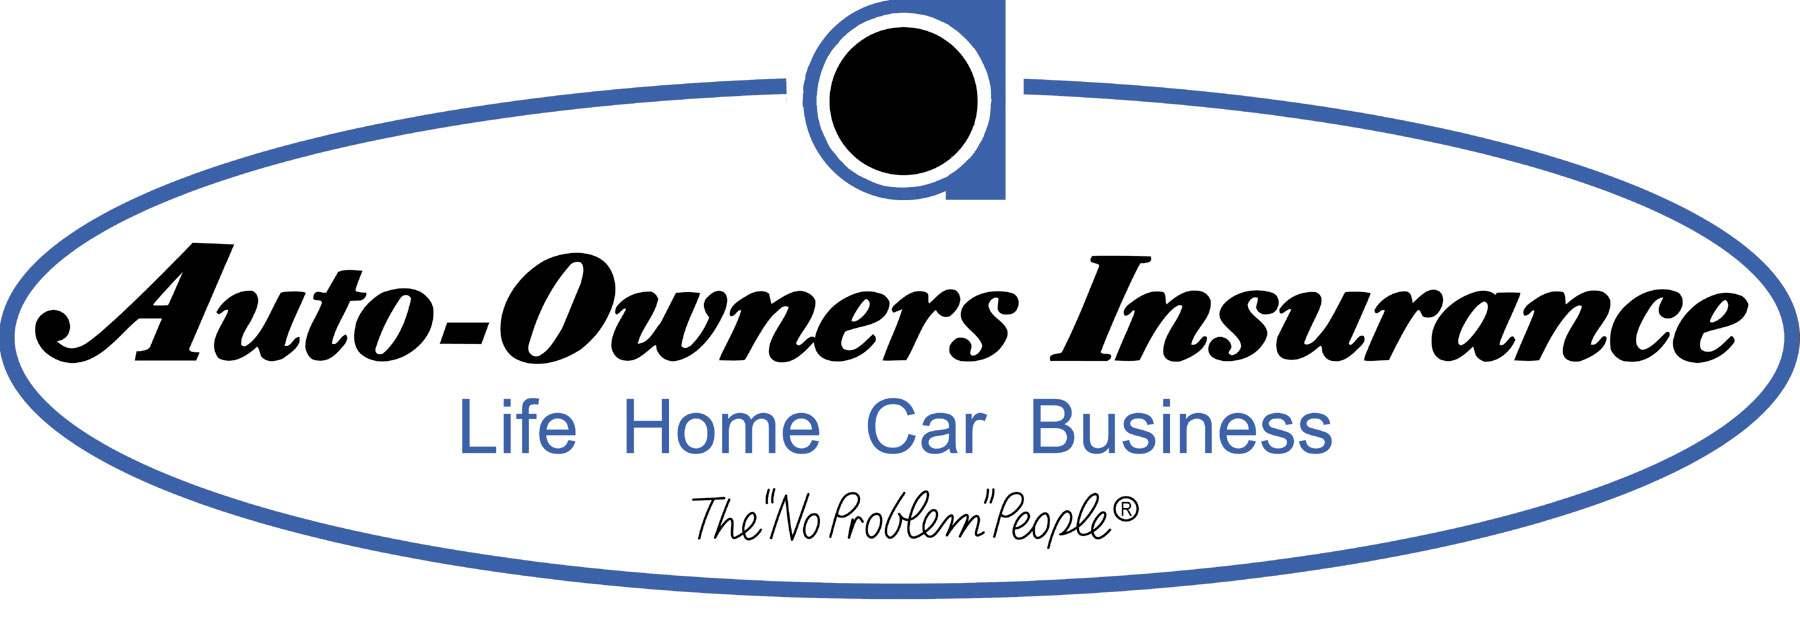 2AutoOwners Ins logo.jpg